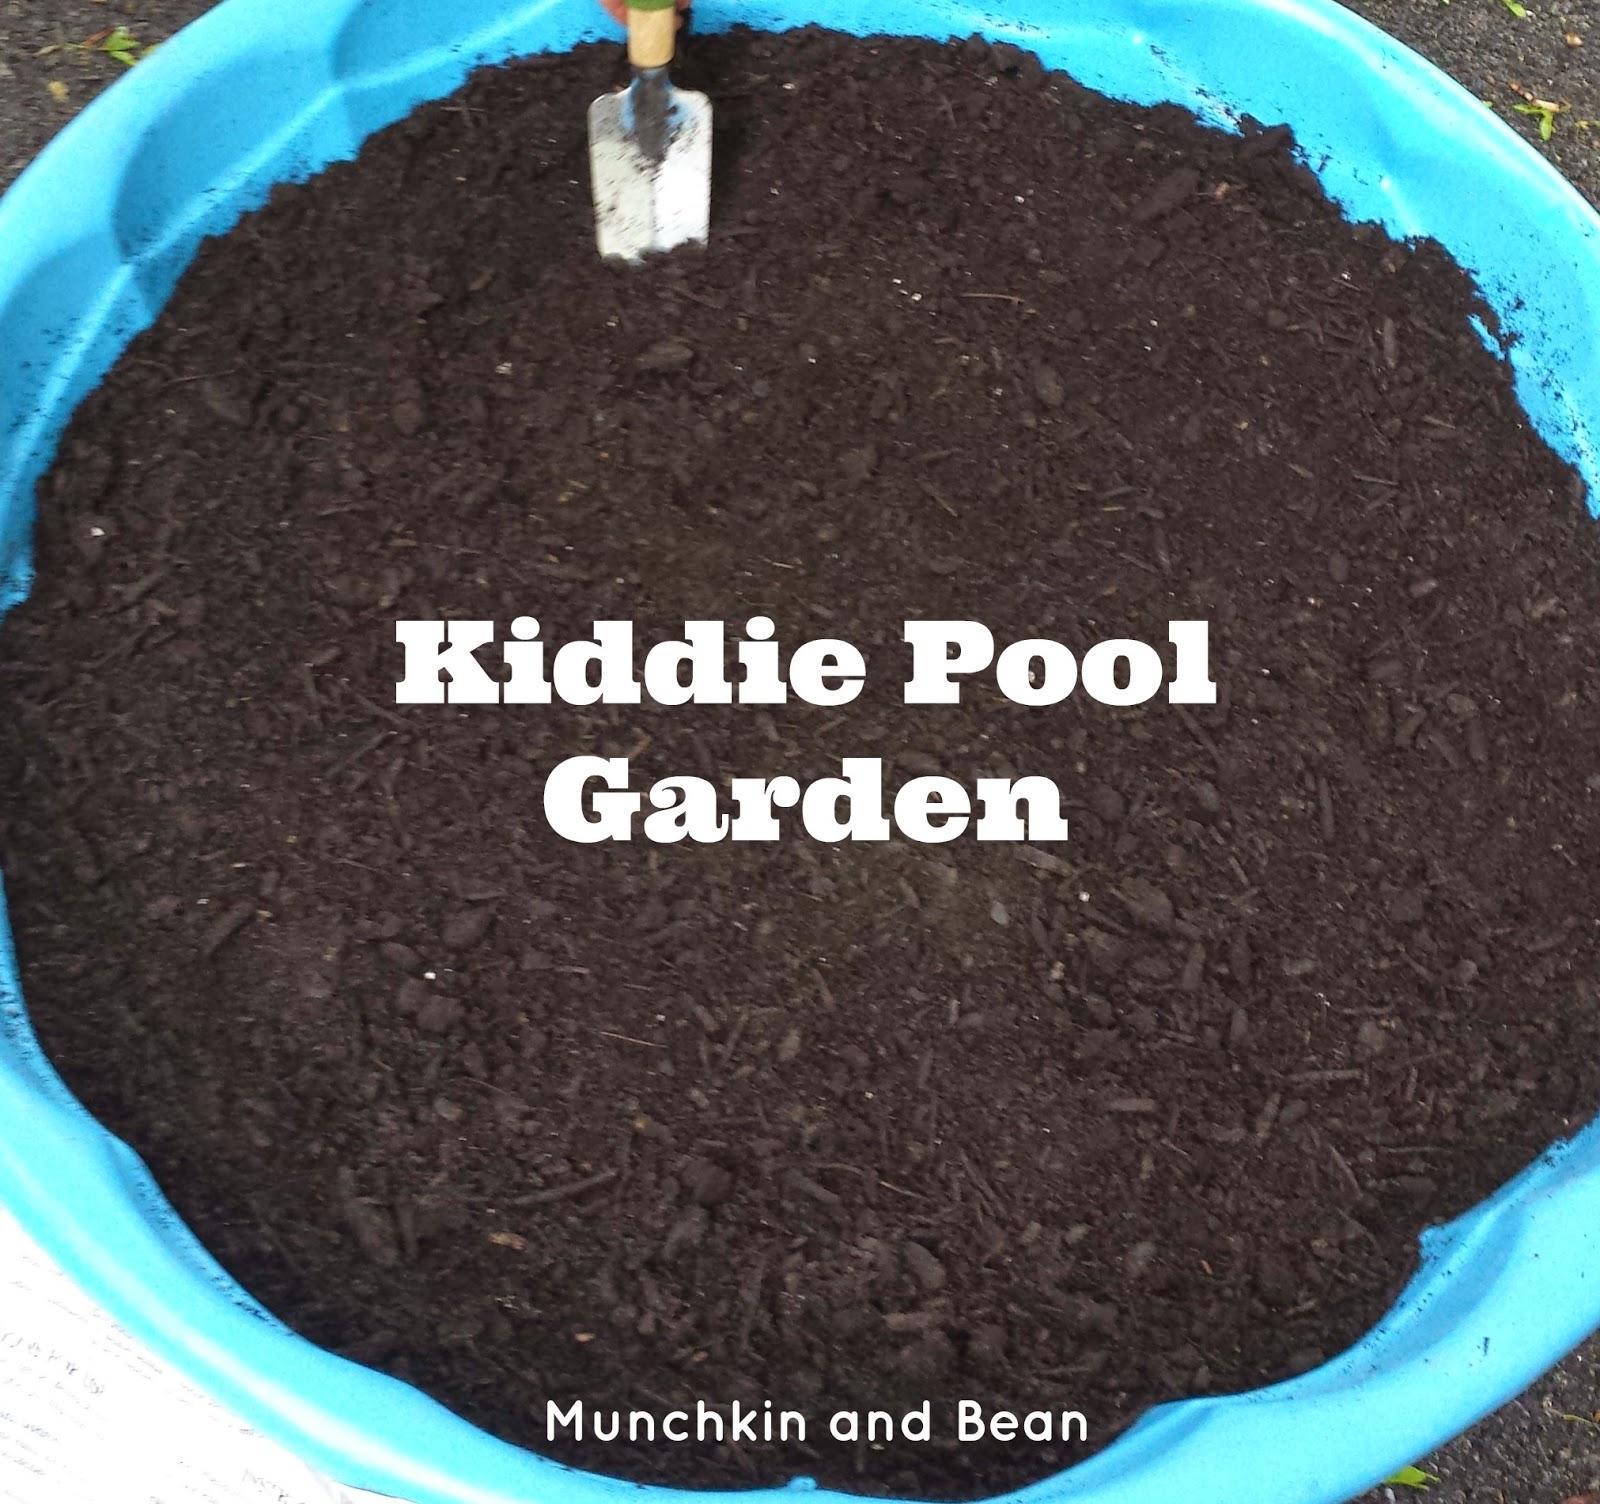 Kiddie Pool Garden